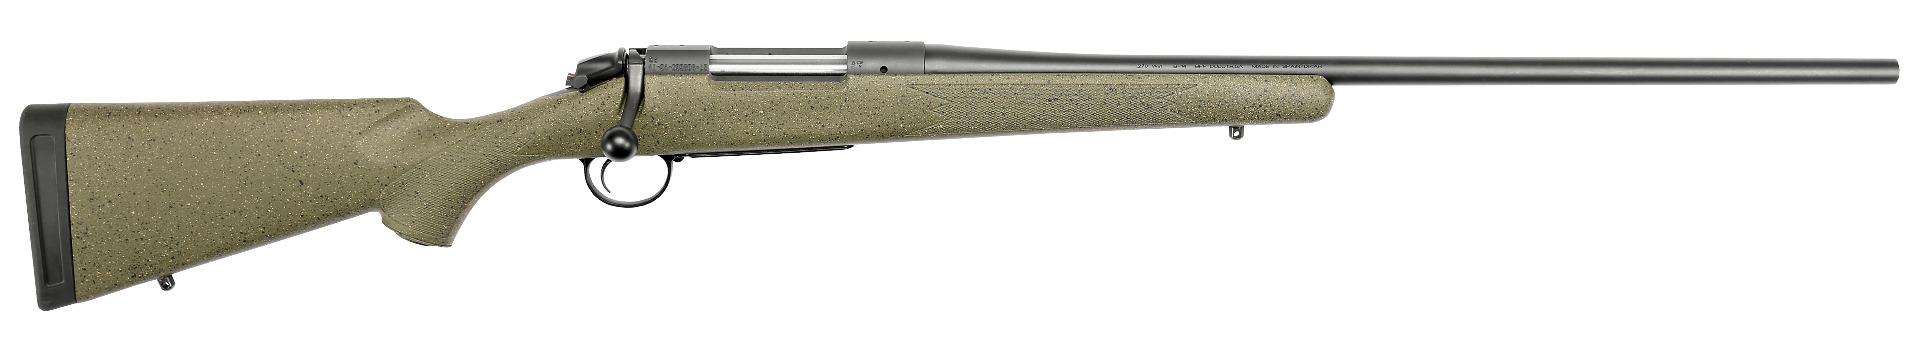 Bergara Hunter 6.5 Creedmoor